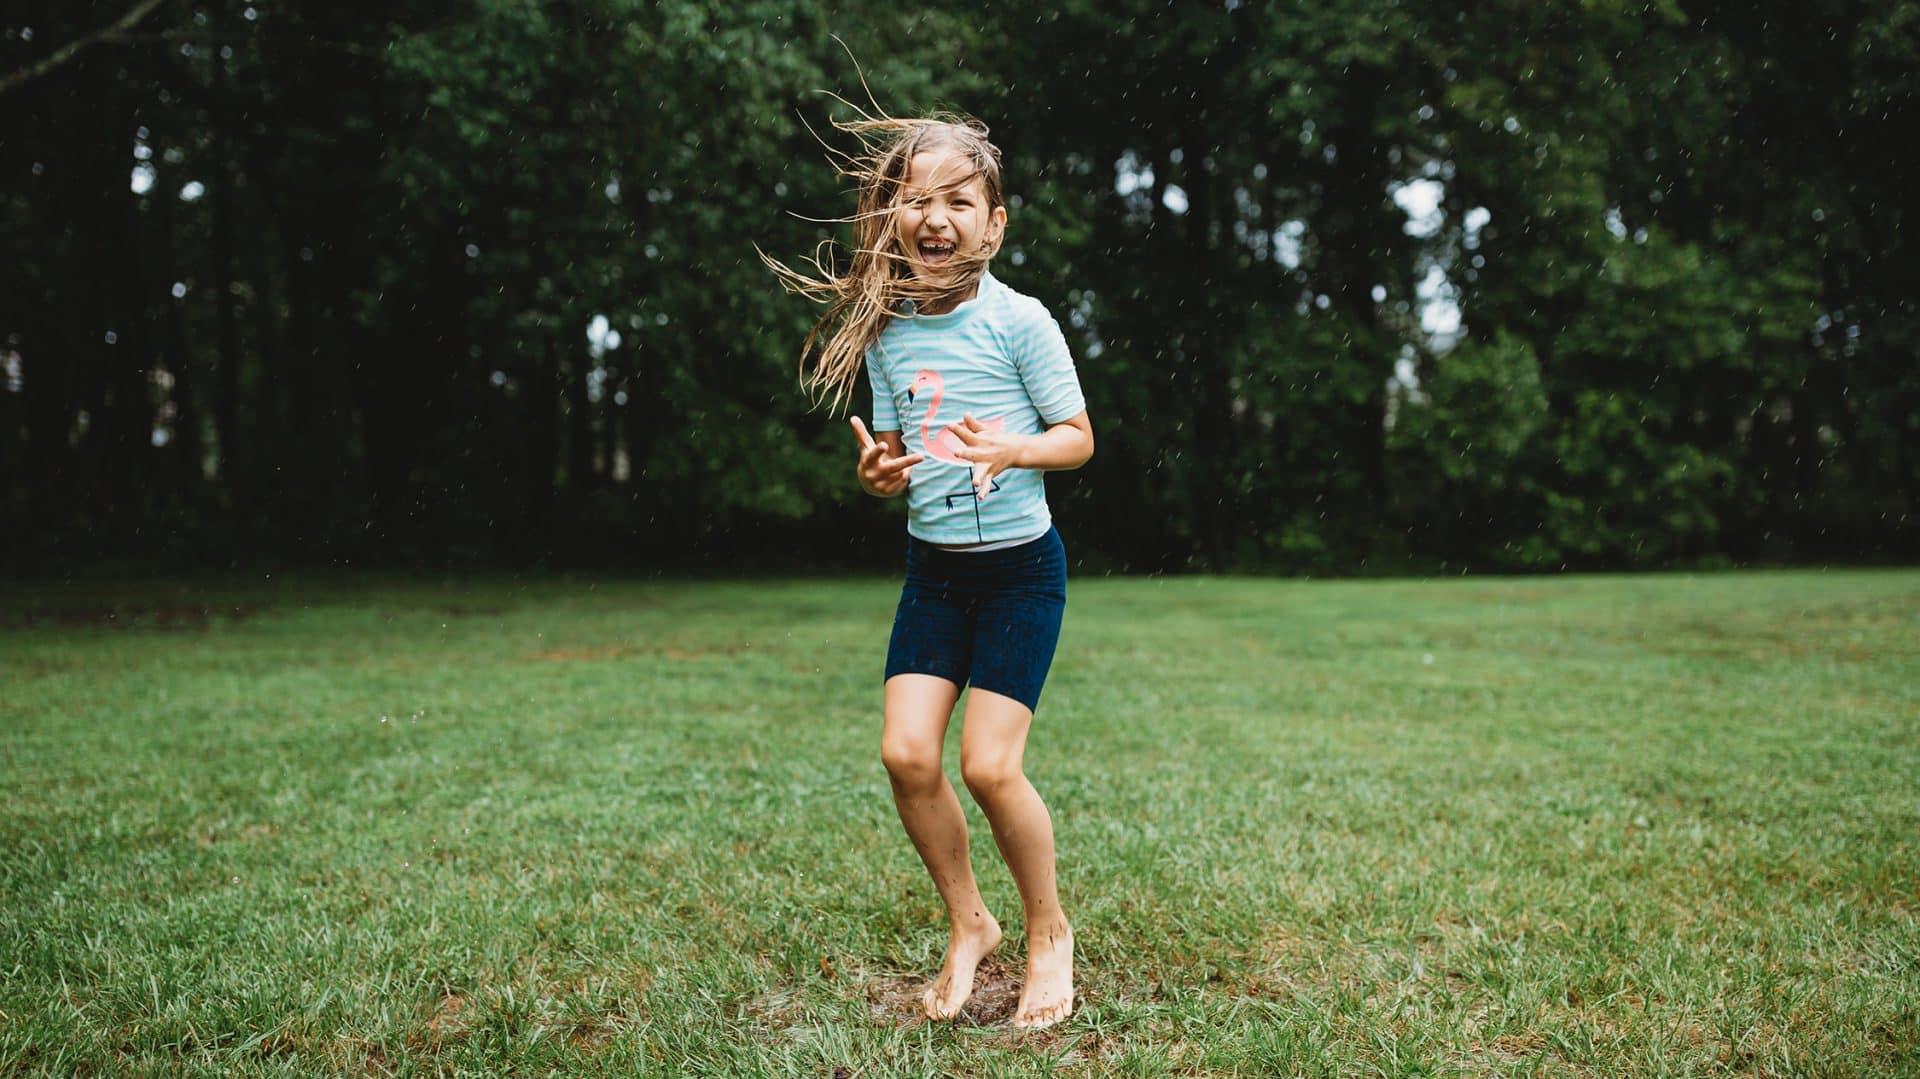 Mike Mielcarz professional photographer little girl smiling jumping rain grass bare feet woods creative repute